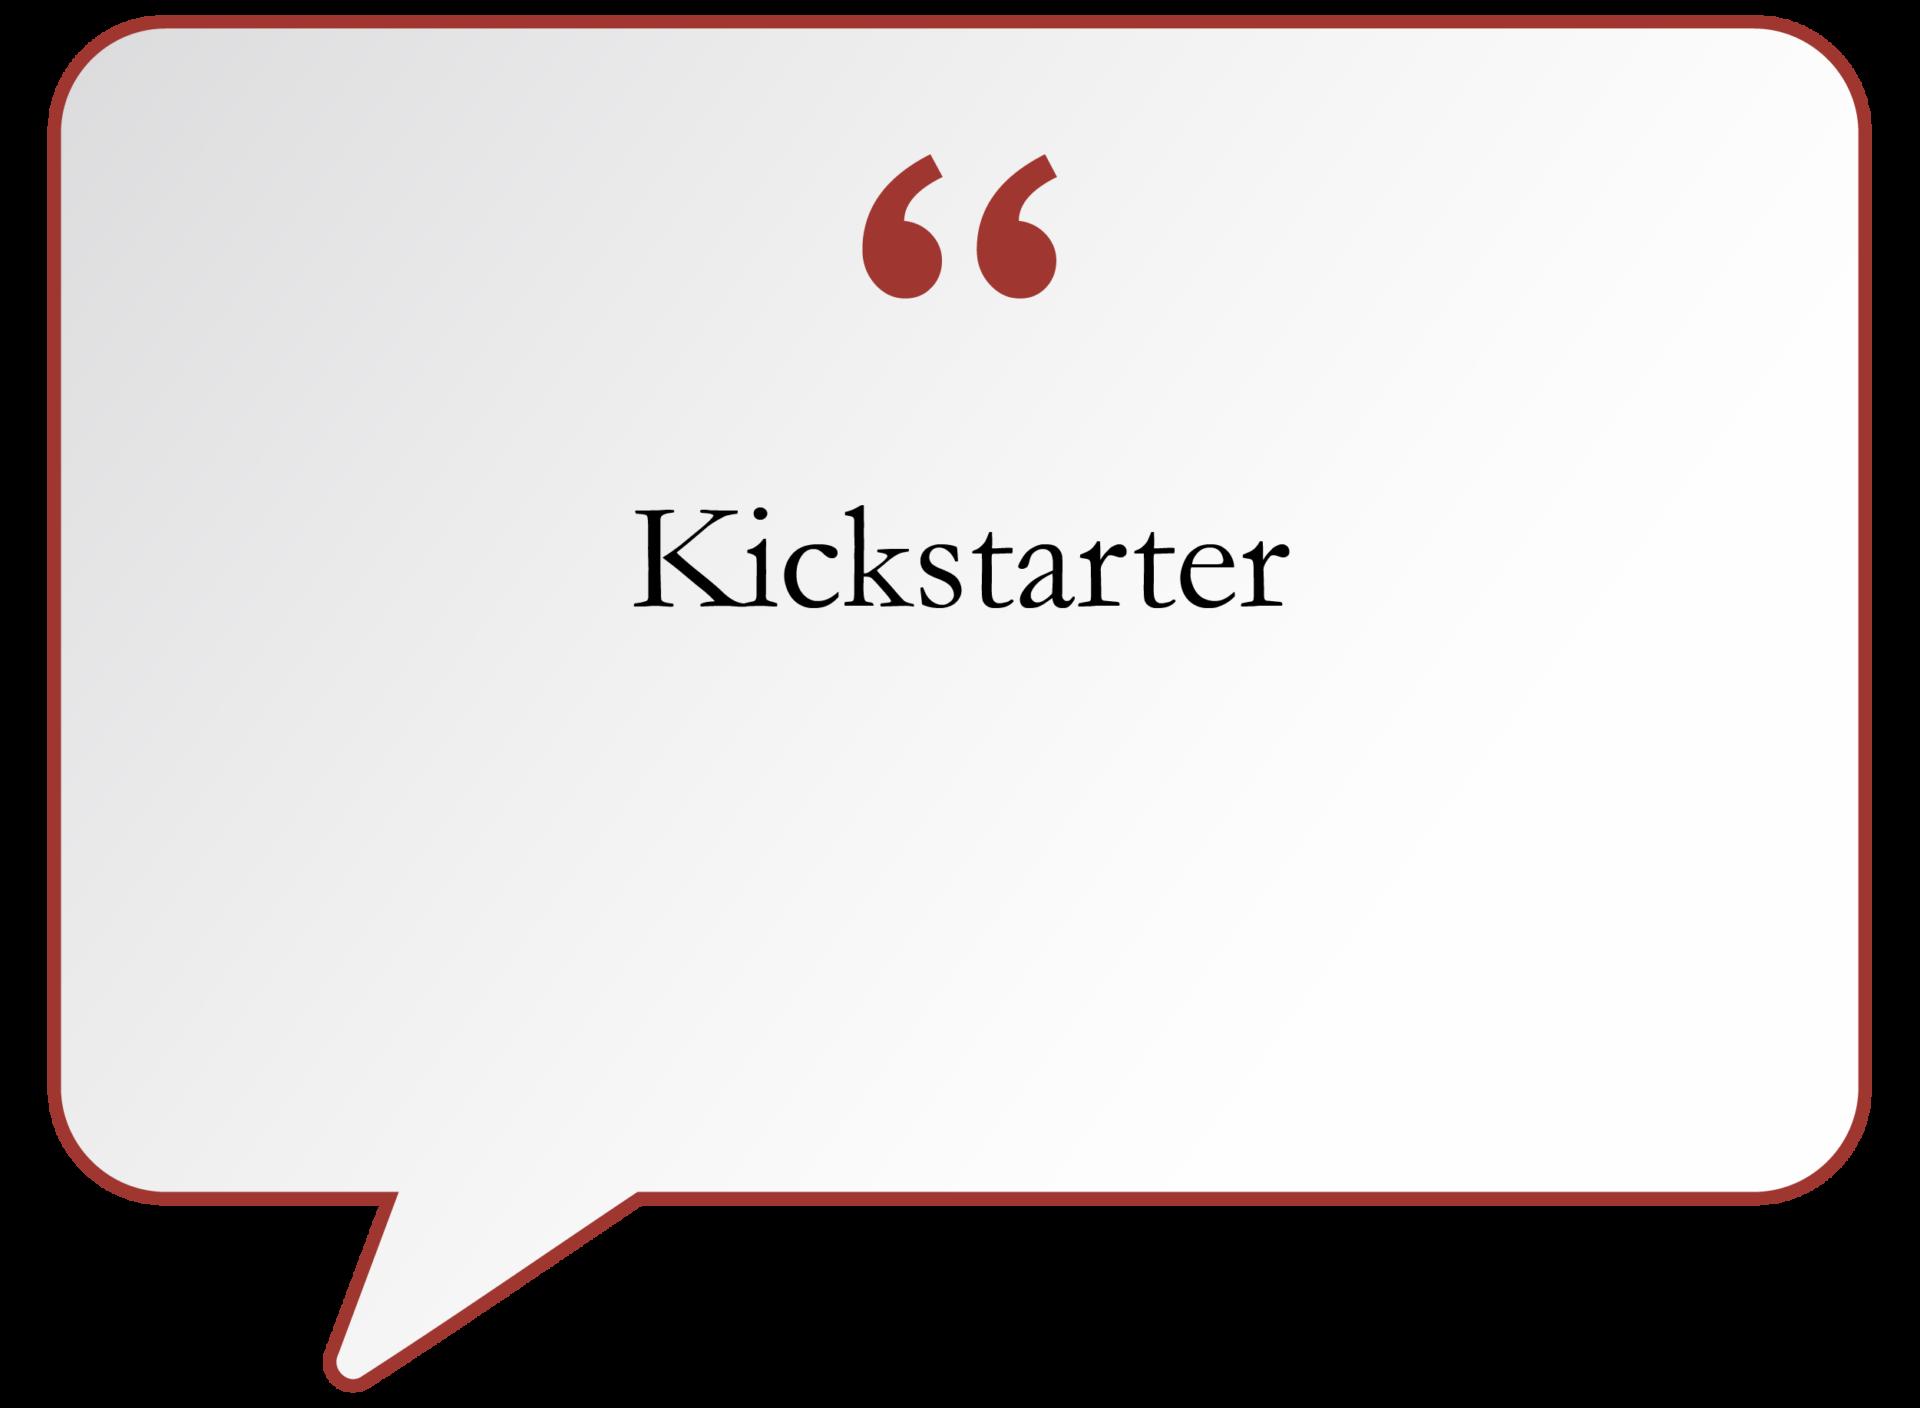 risbjergrelation kickstarter